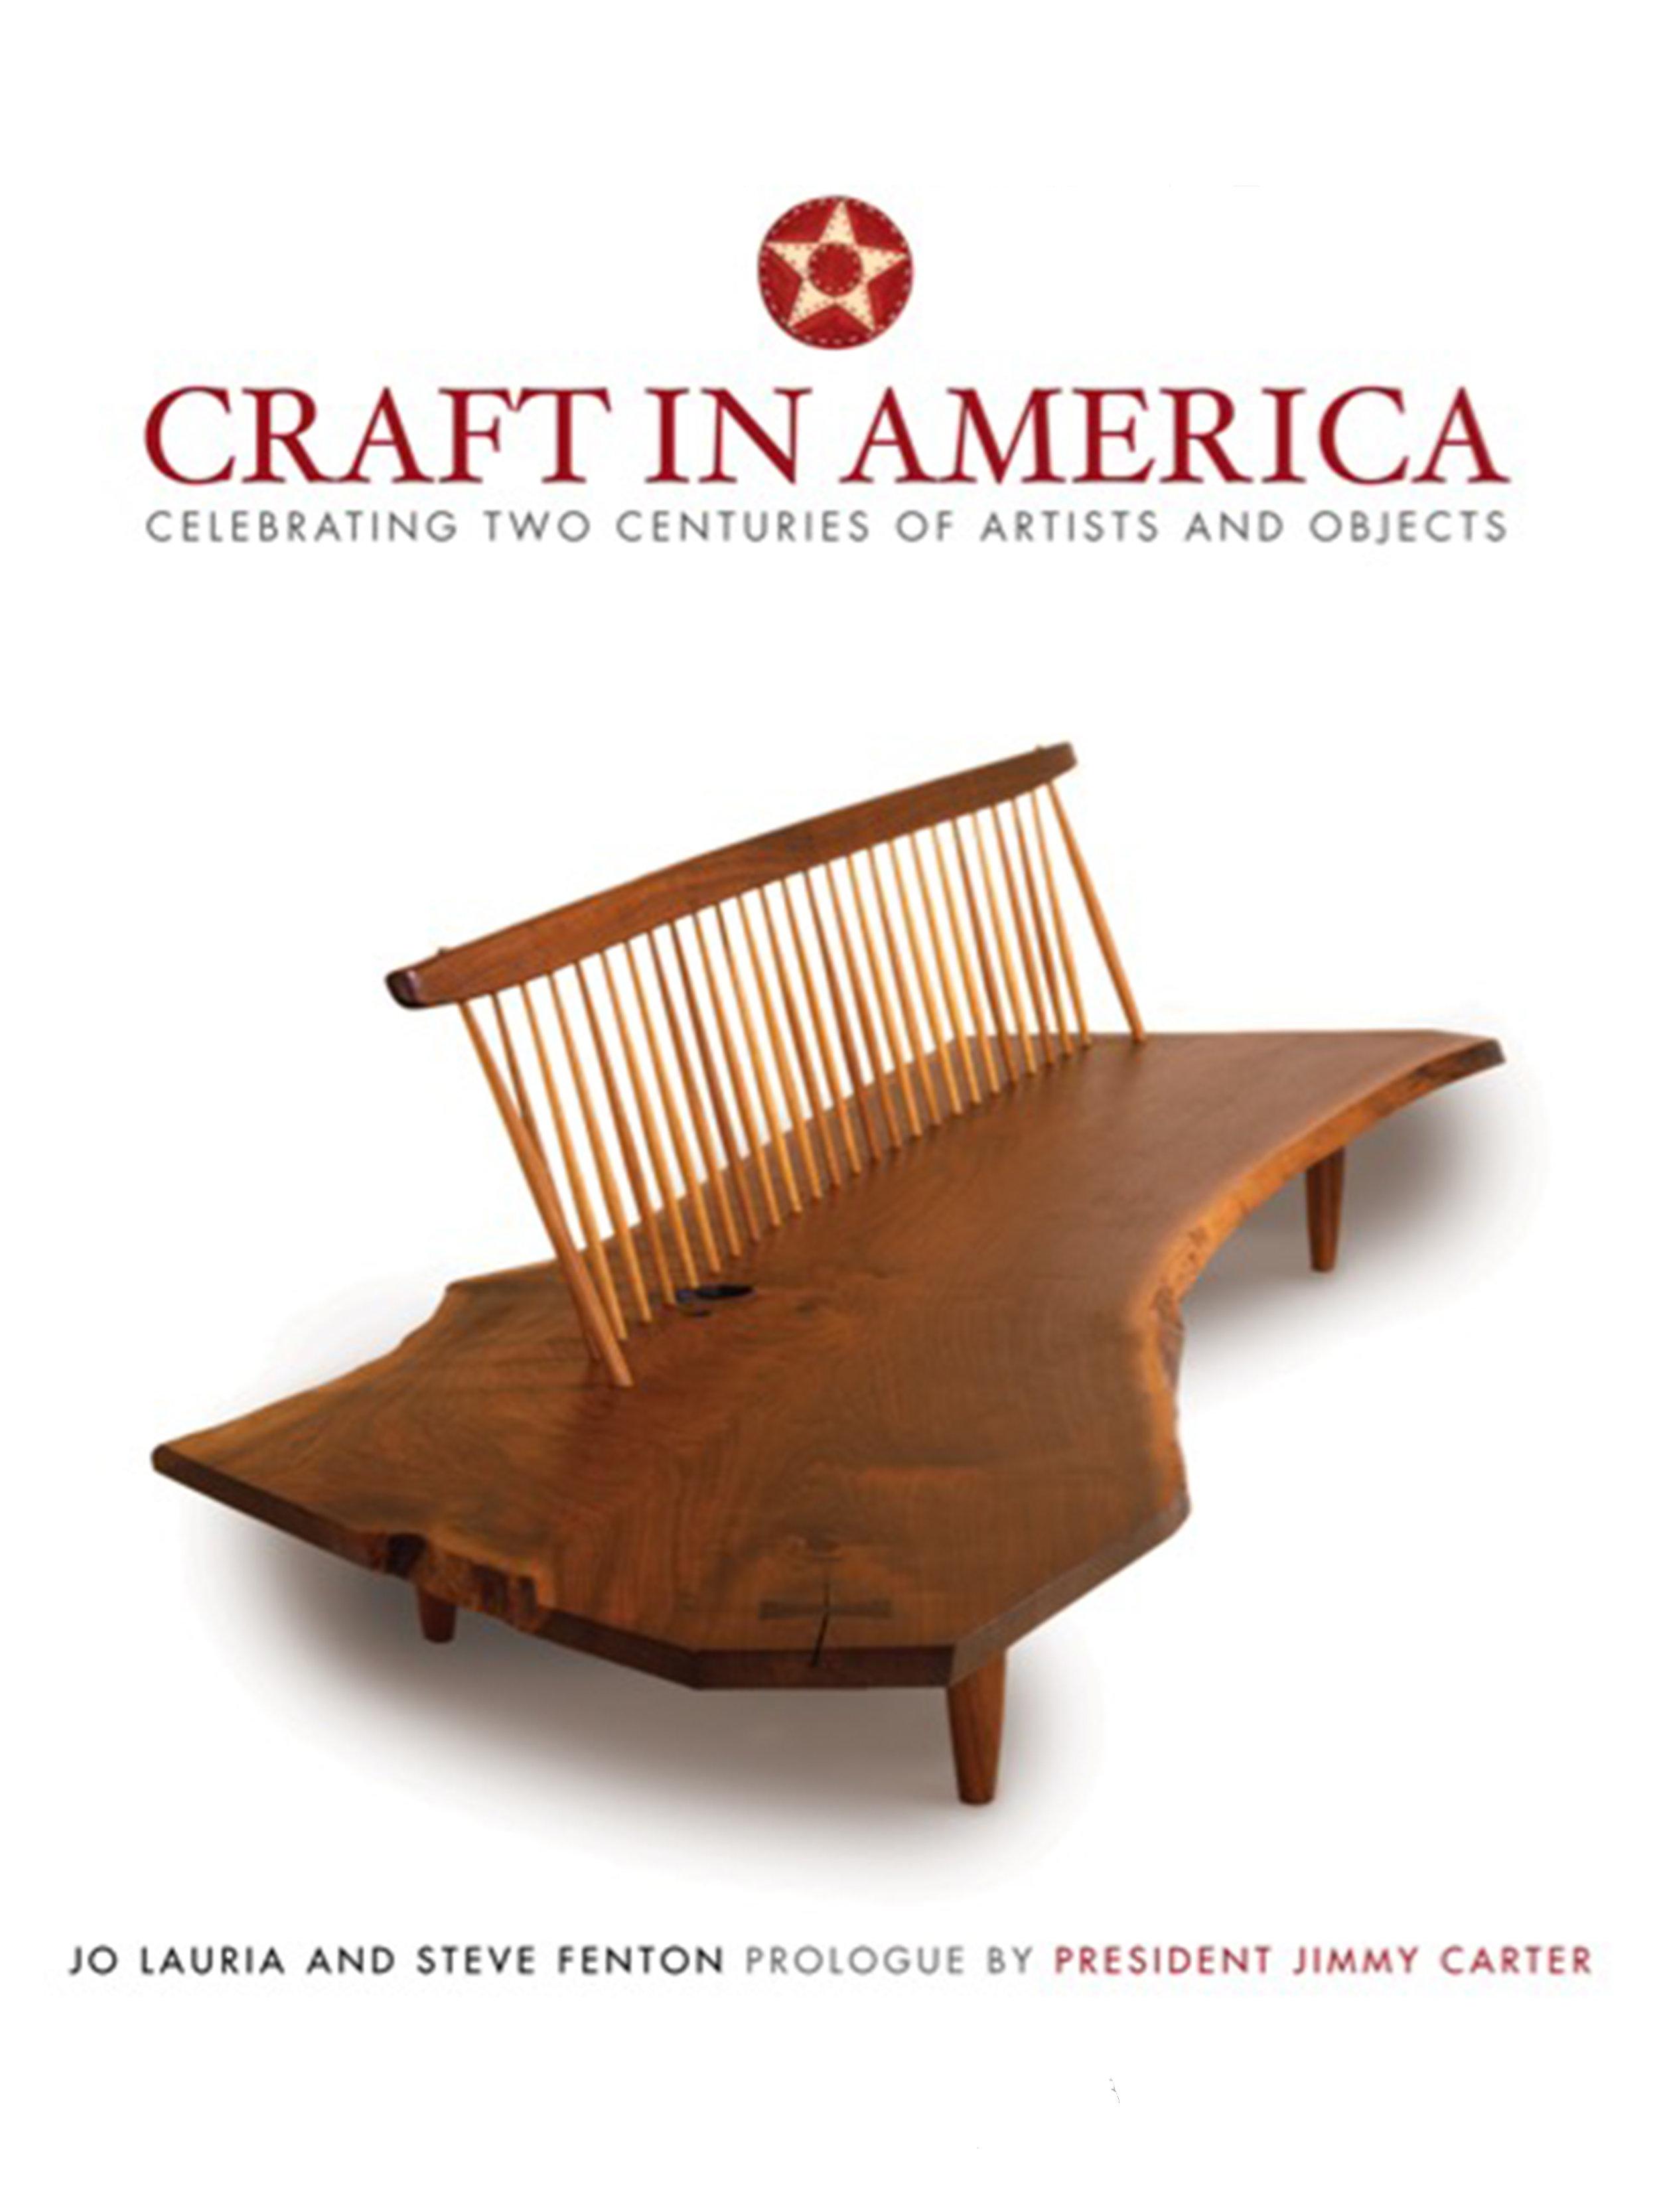 craftinamericabook_webcover.jpg